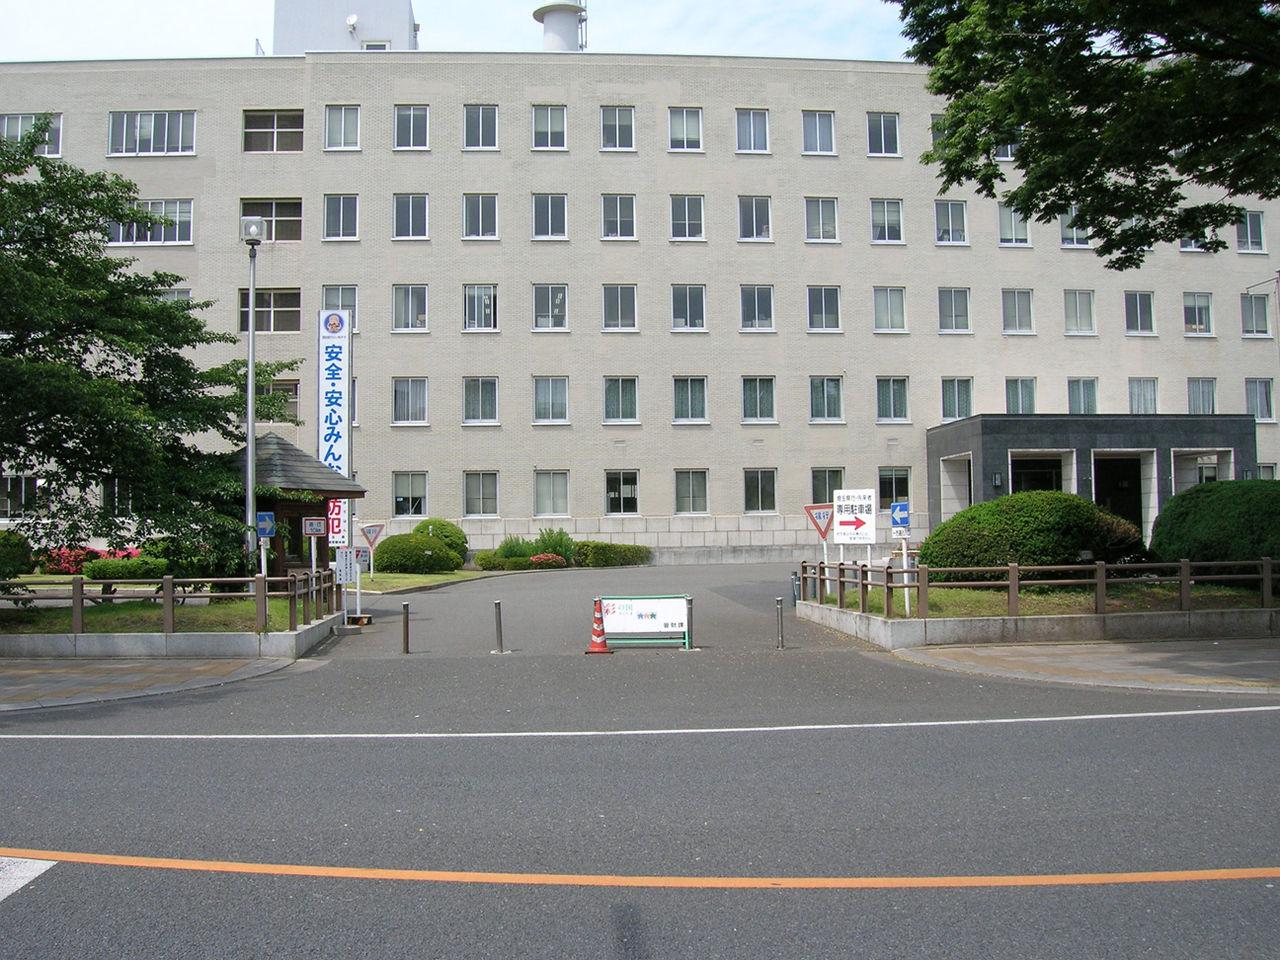 埼玉県飯能市の詐欺・窃盗事件で逮捕 | 詐欺事件の …